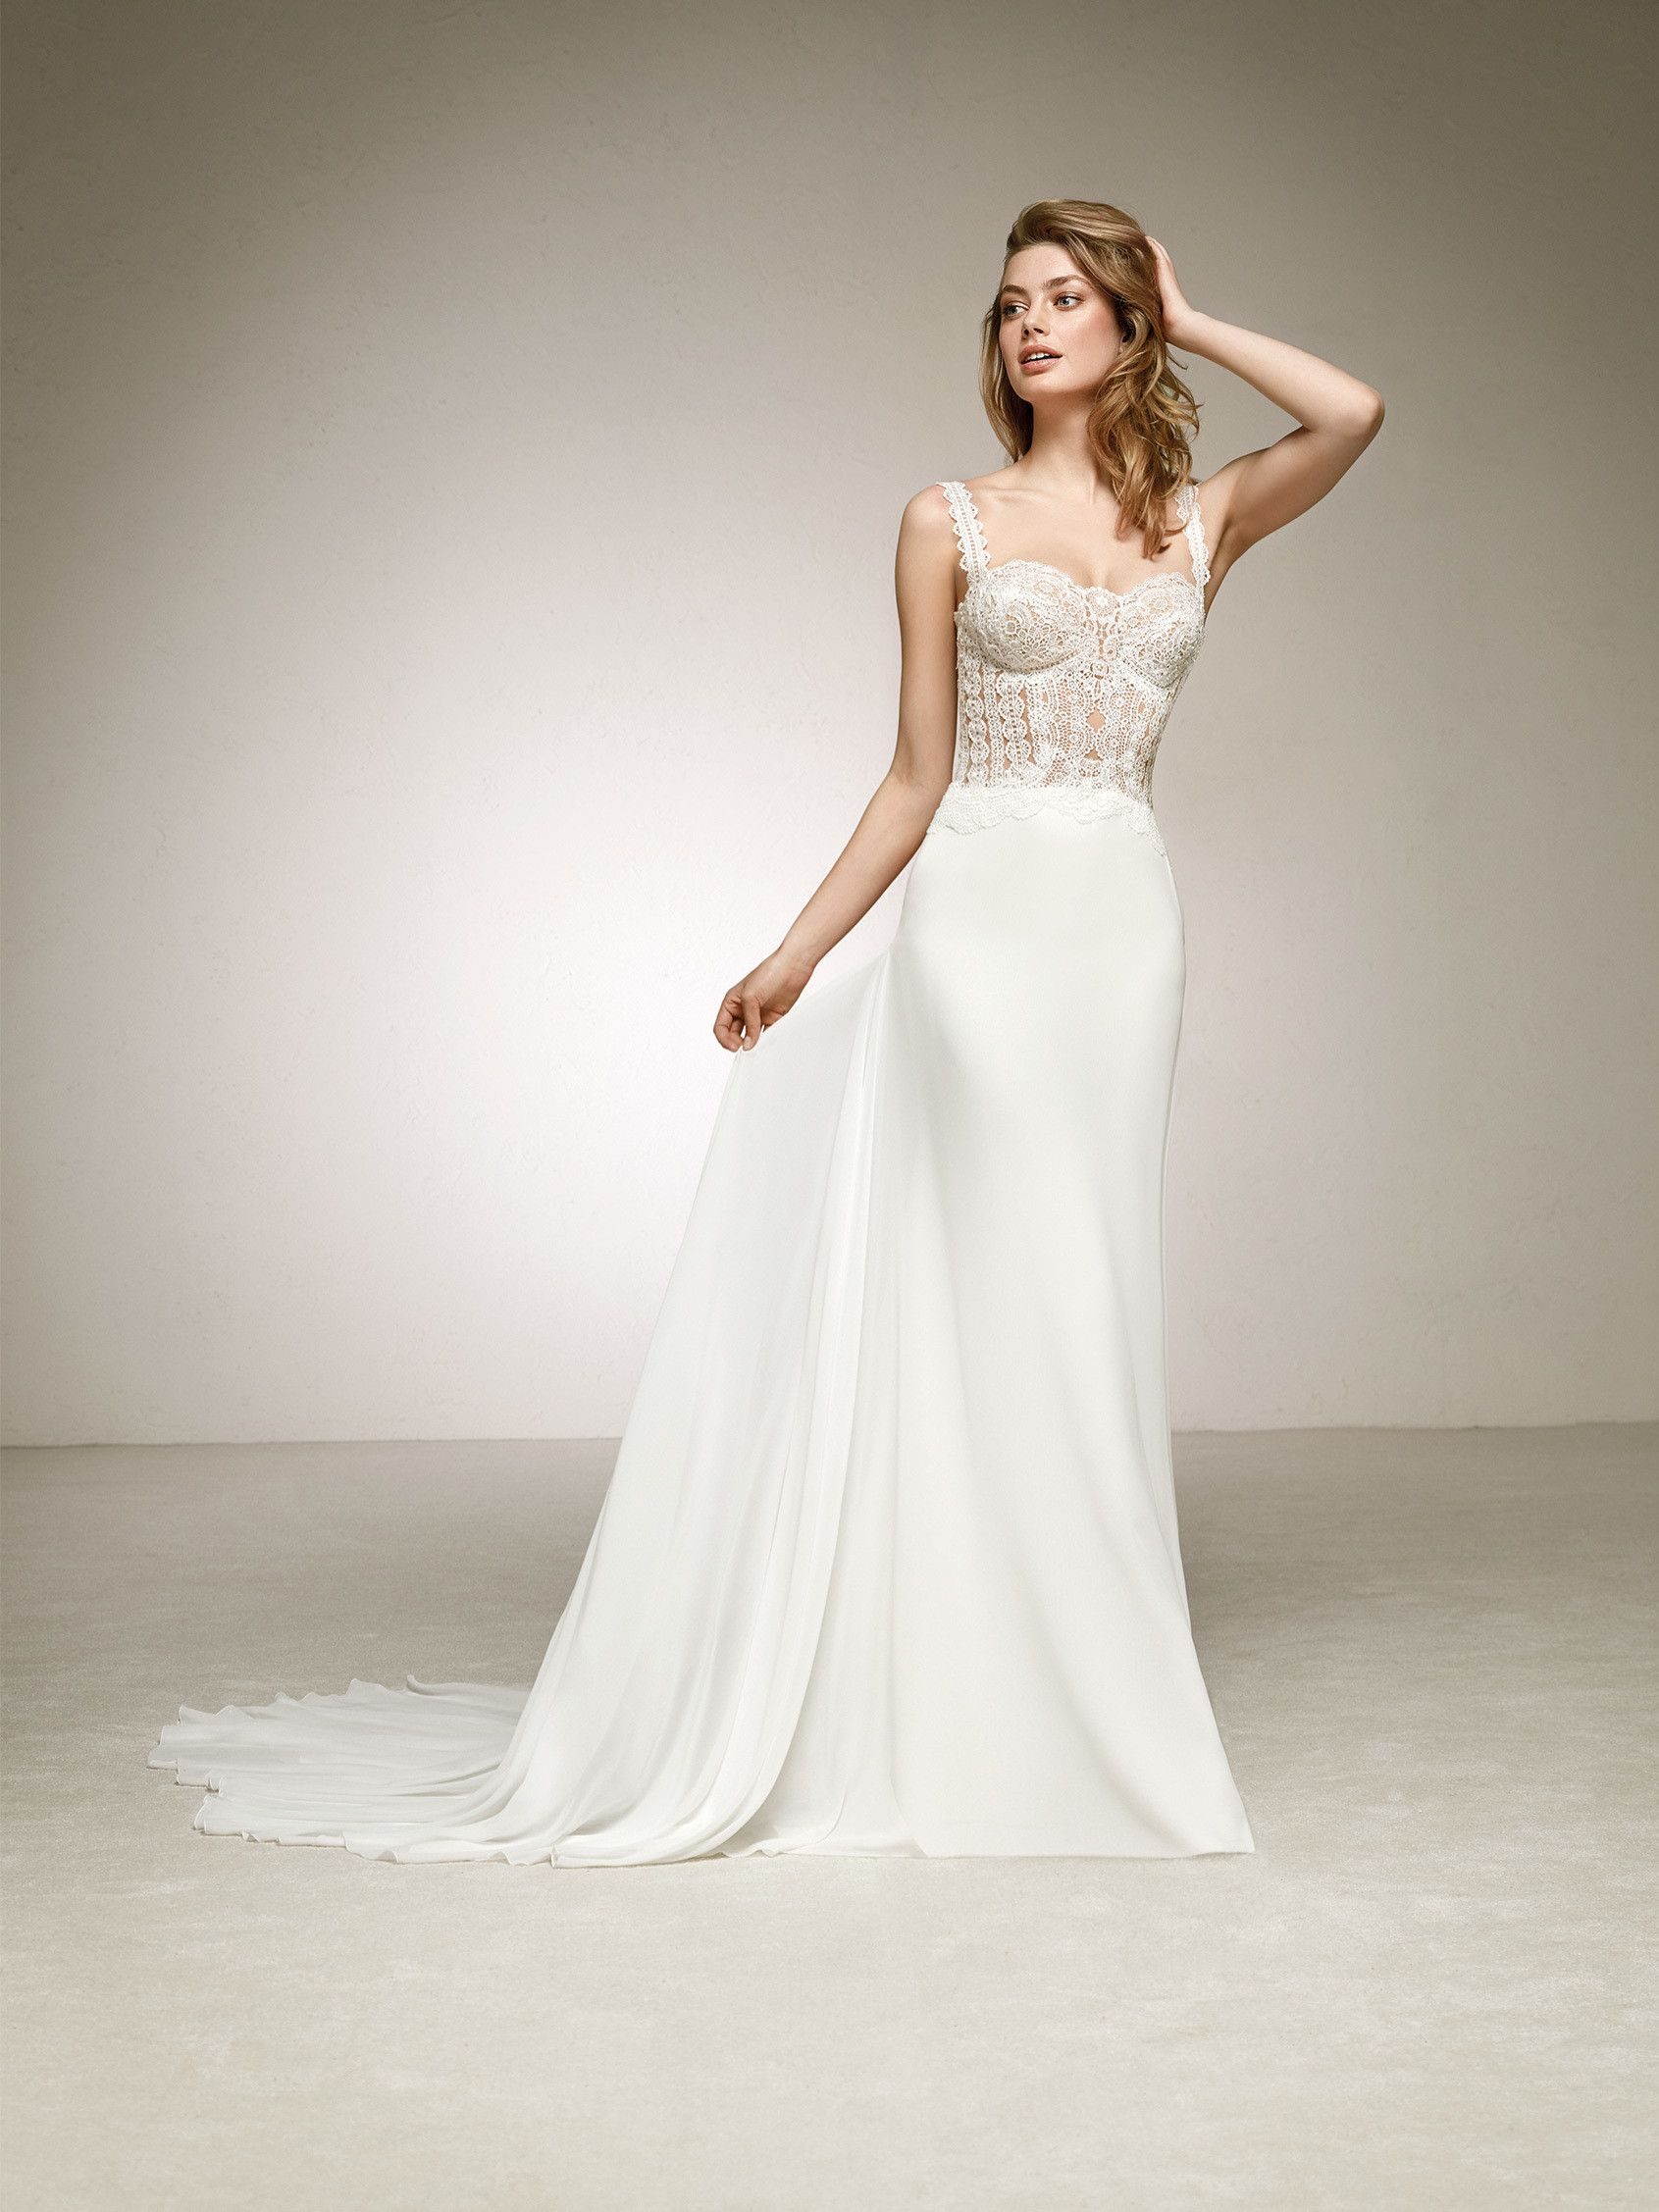 simple and romantic wedding dress | Wedding Dresses Modest ...